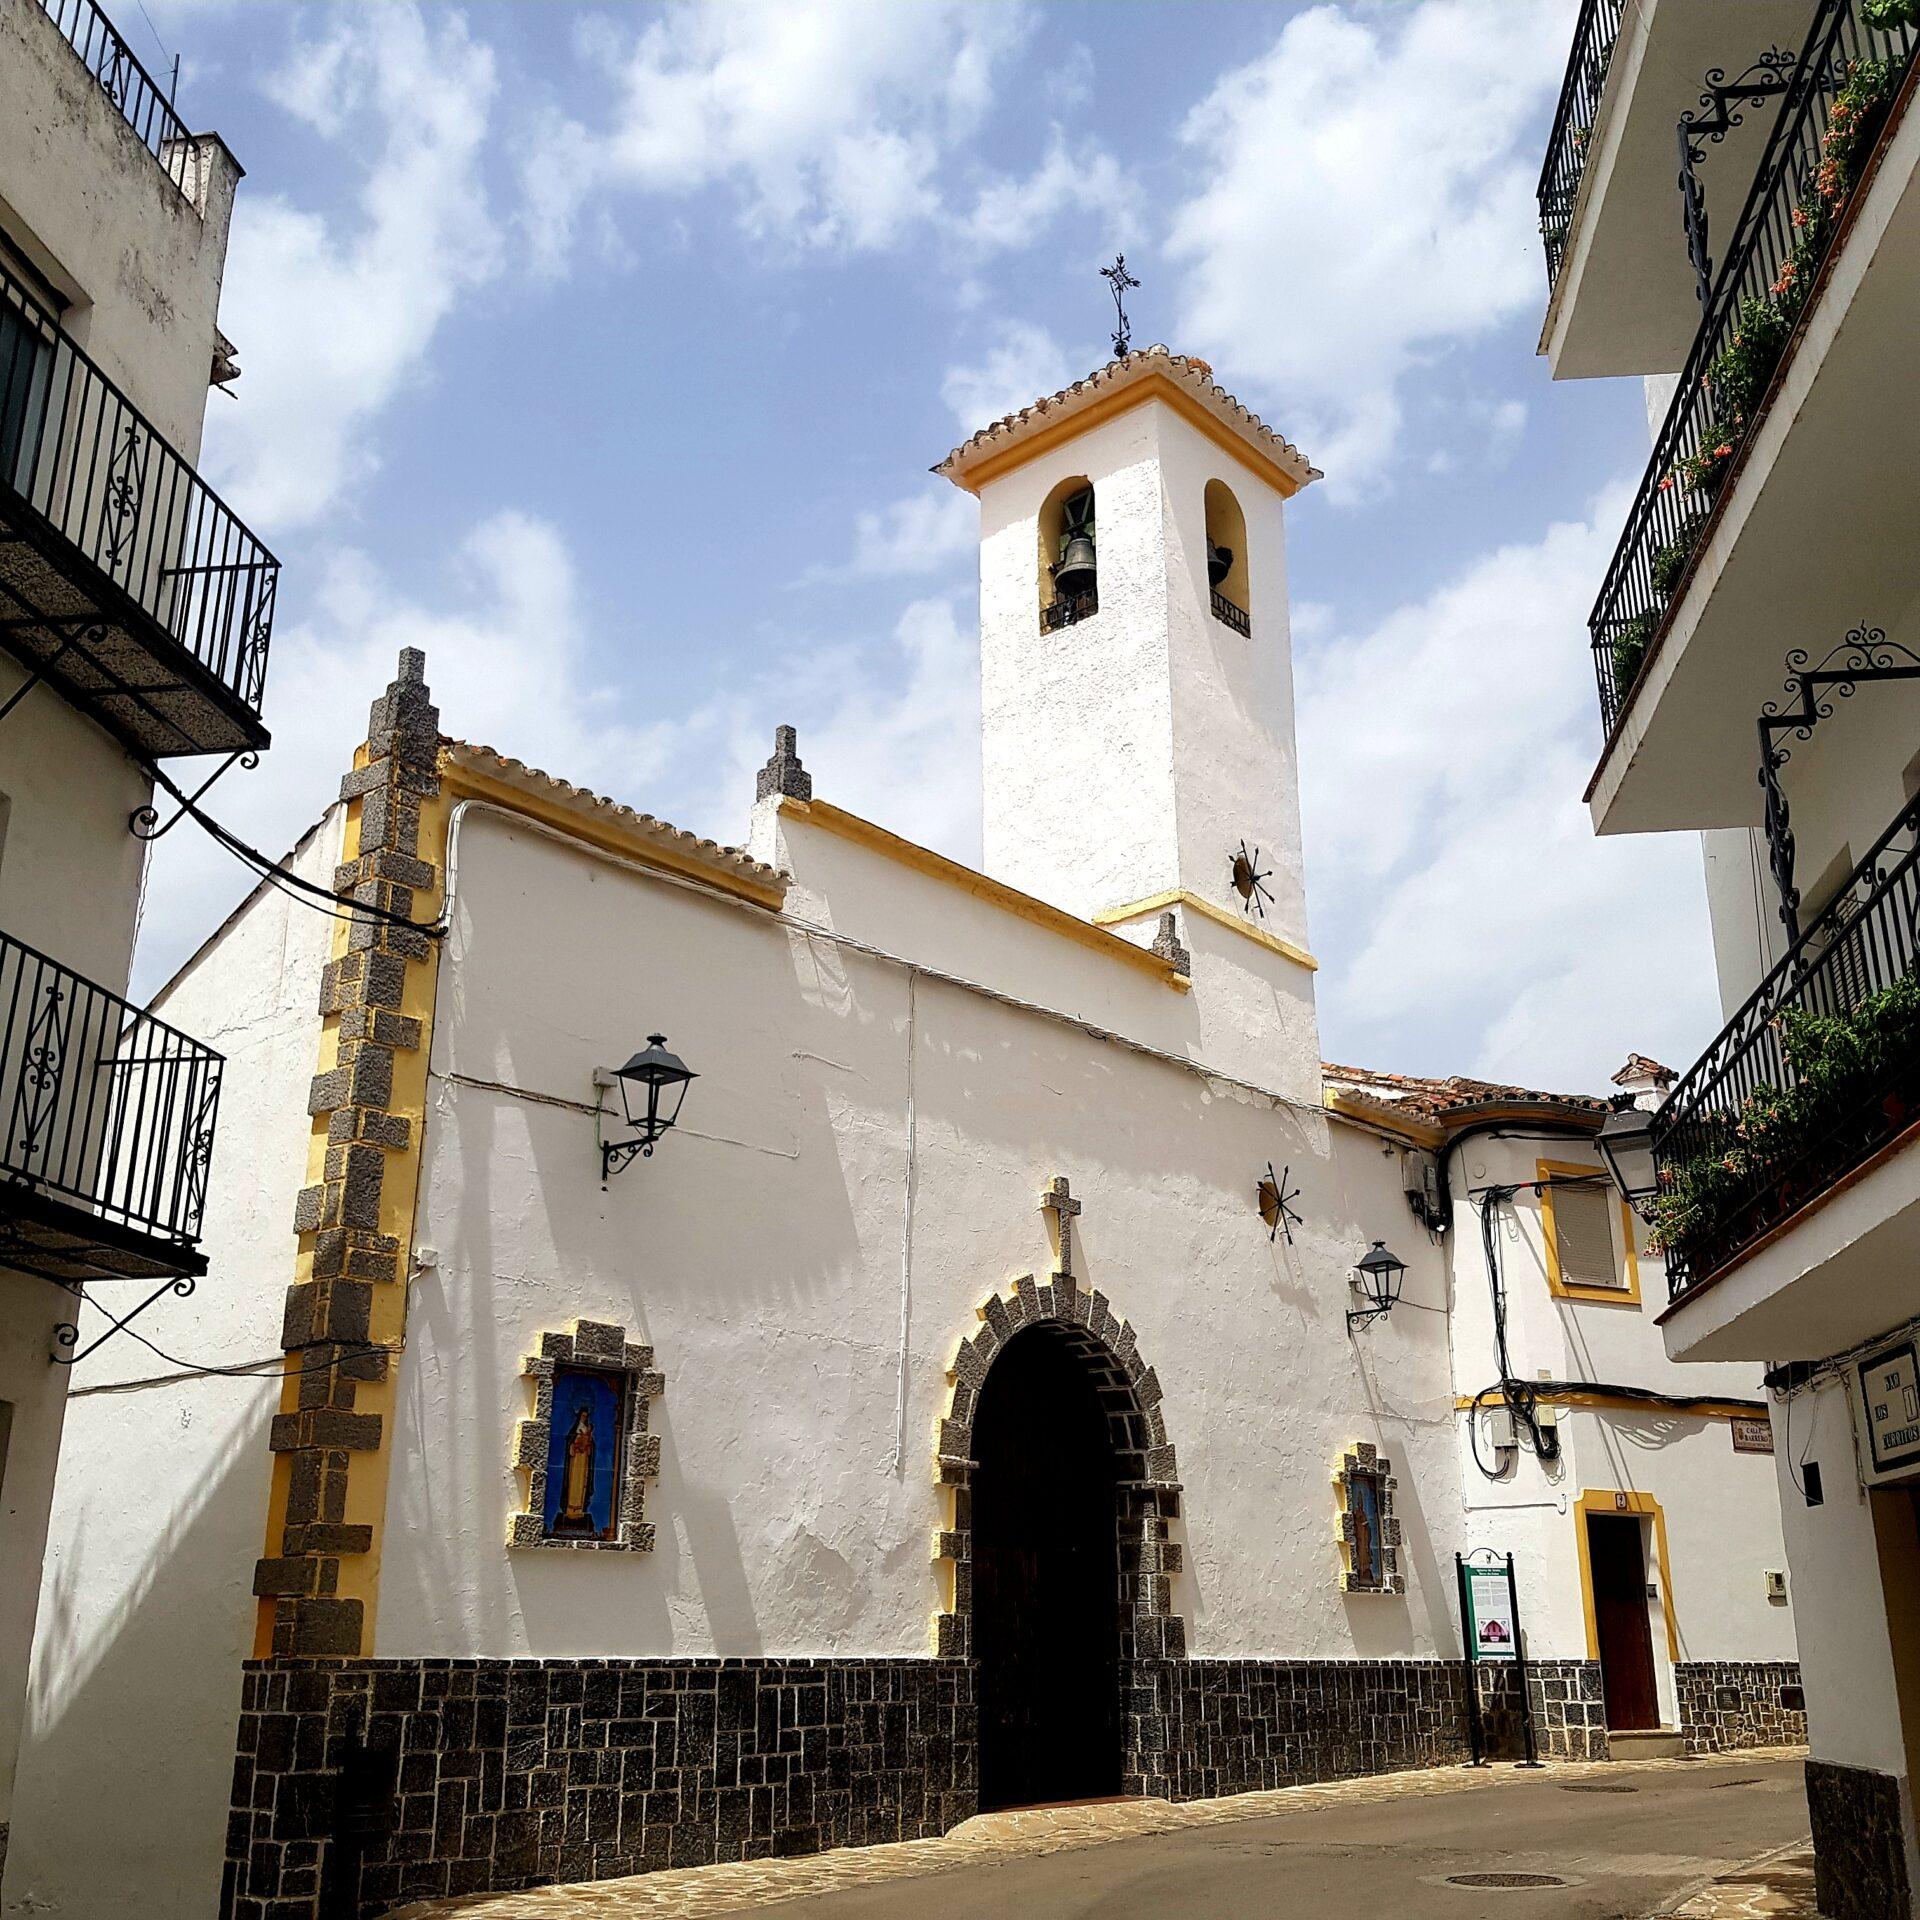 Church Santa Rosa de Lima Igualeja